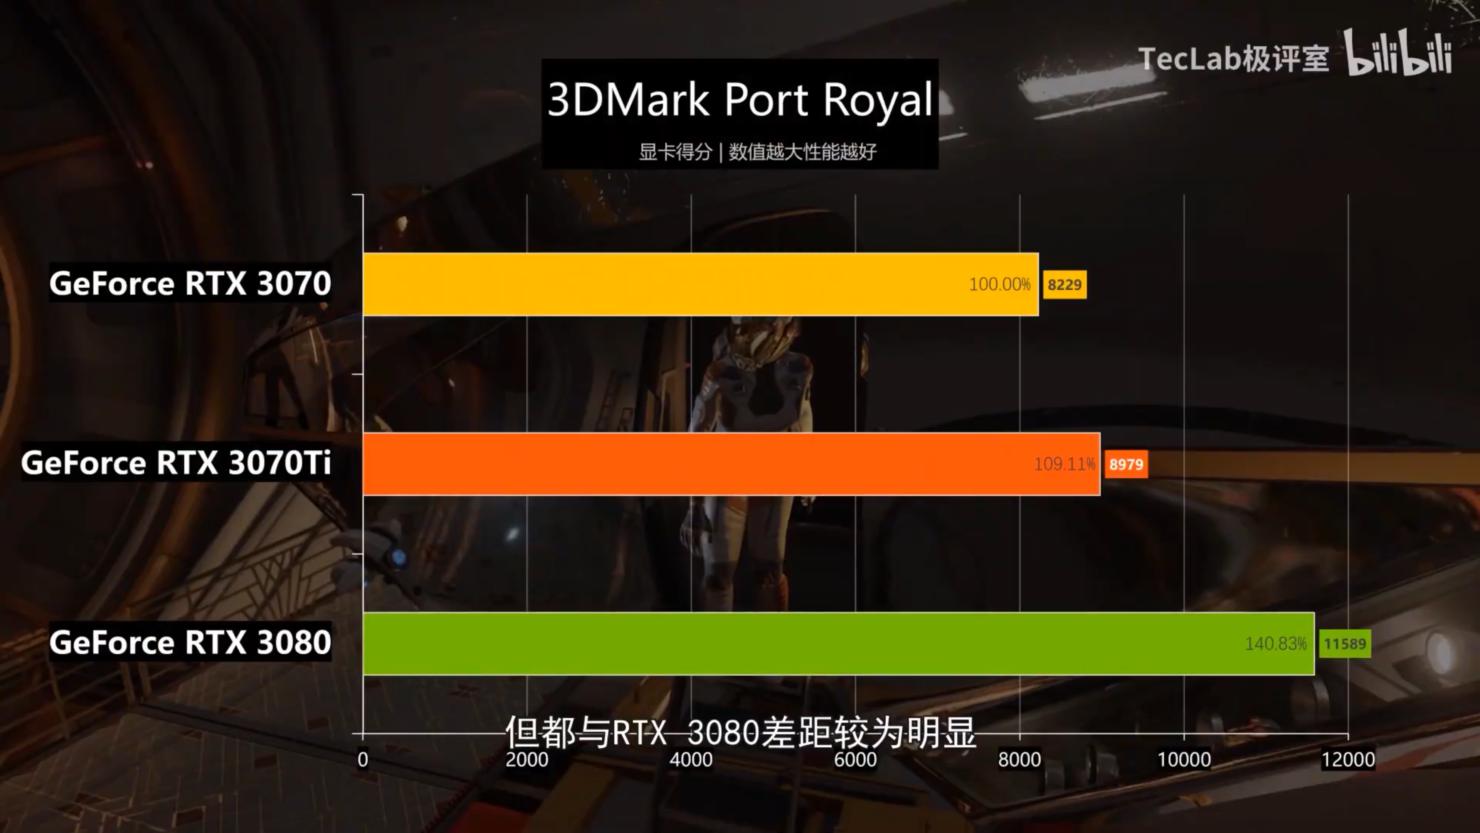 nvidia-geforce-rtx-3070-ti-graphics-card-benchmark-performance-leak-_3dmark-port-royal